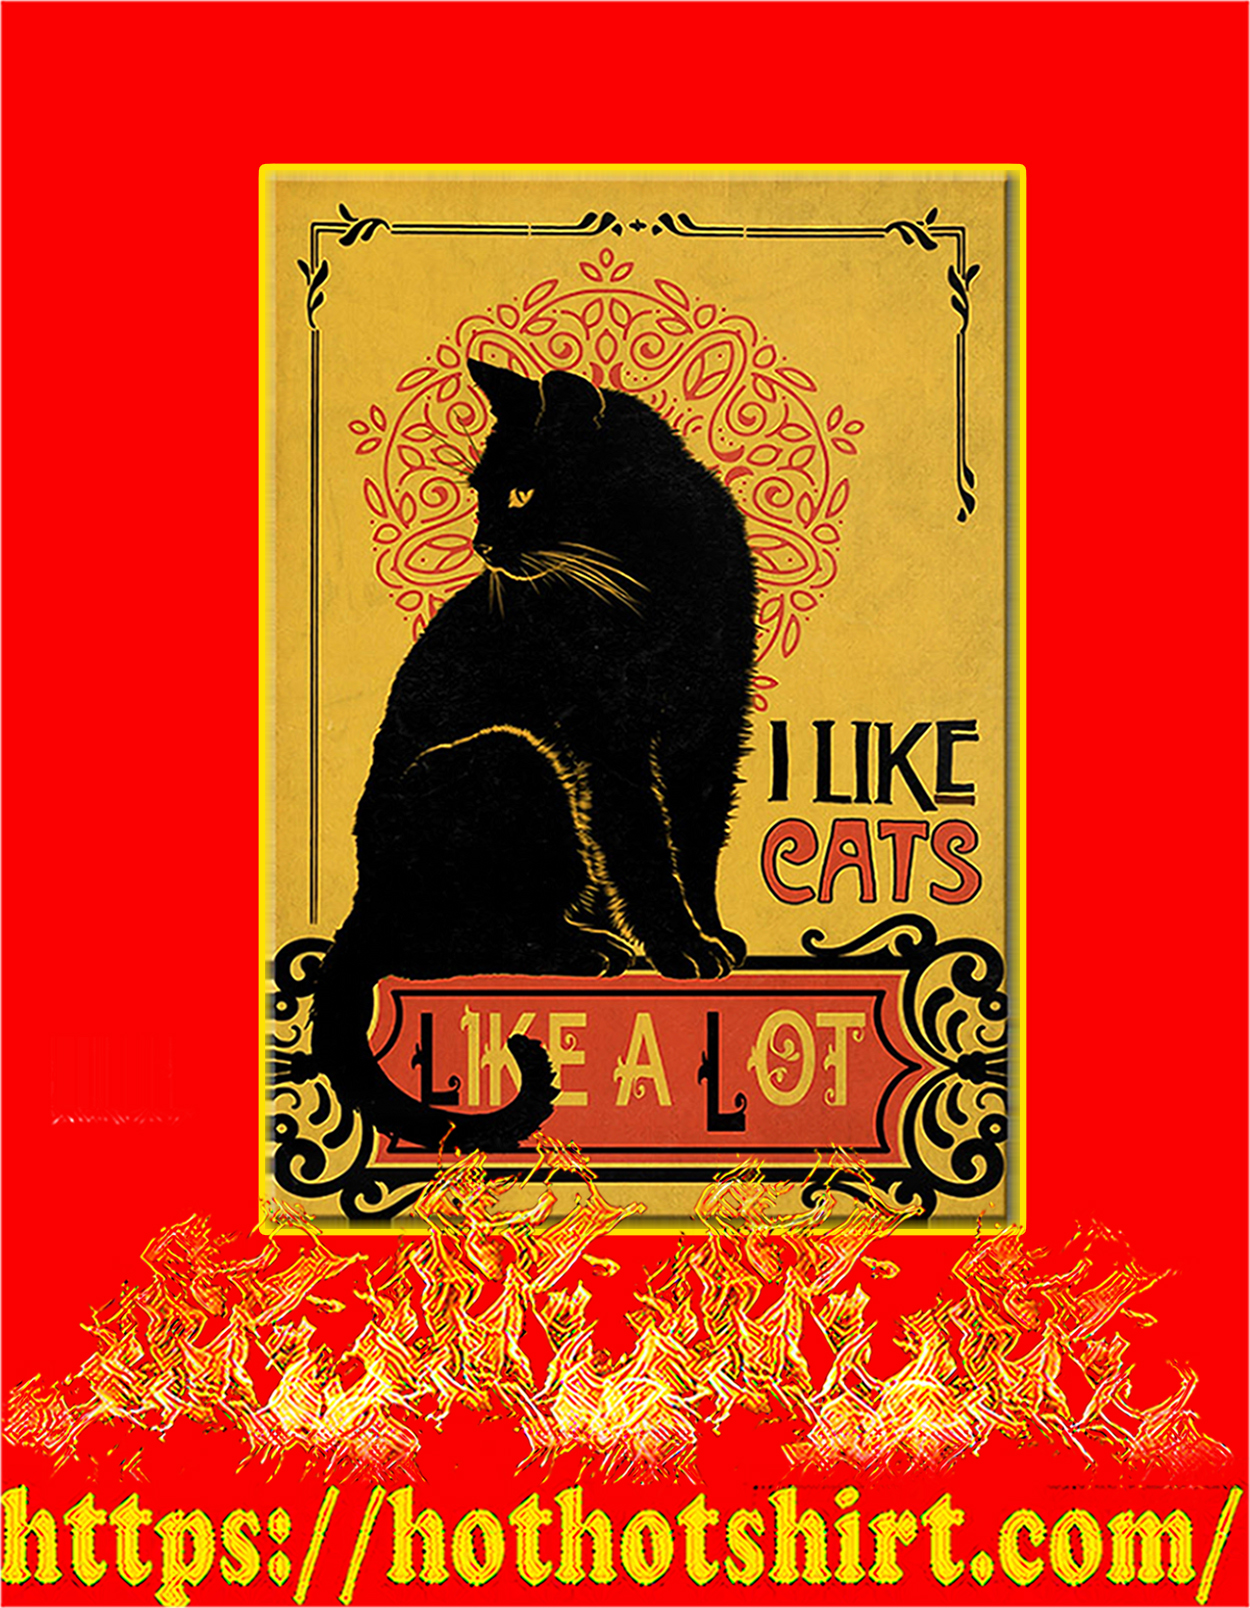 Black cat I like cats like a lot poster - A3